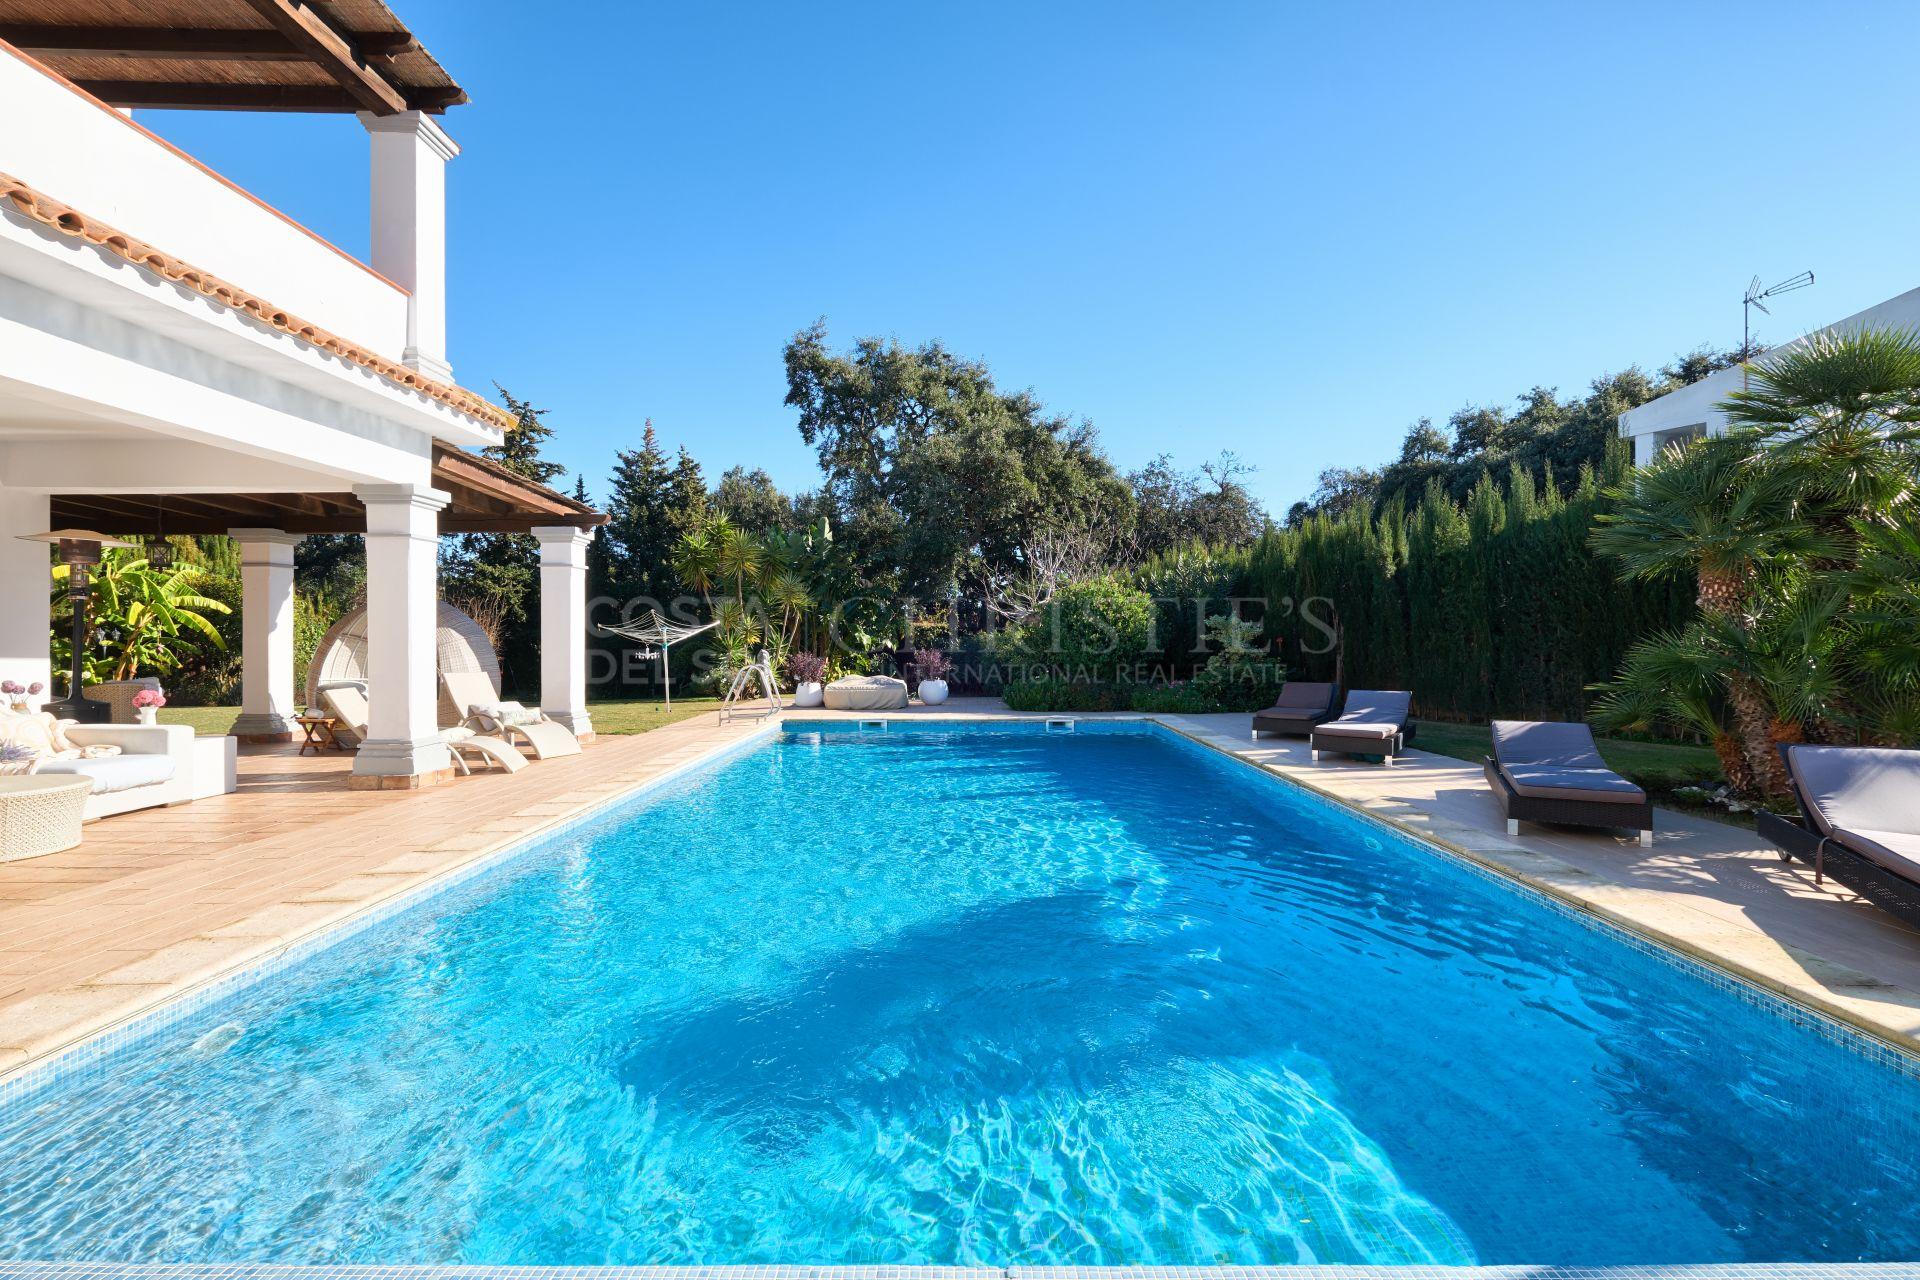 Family Home in Sotogrande | Christie's International Real Estate